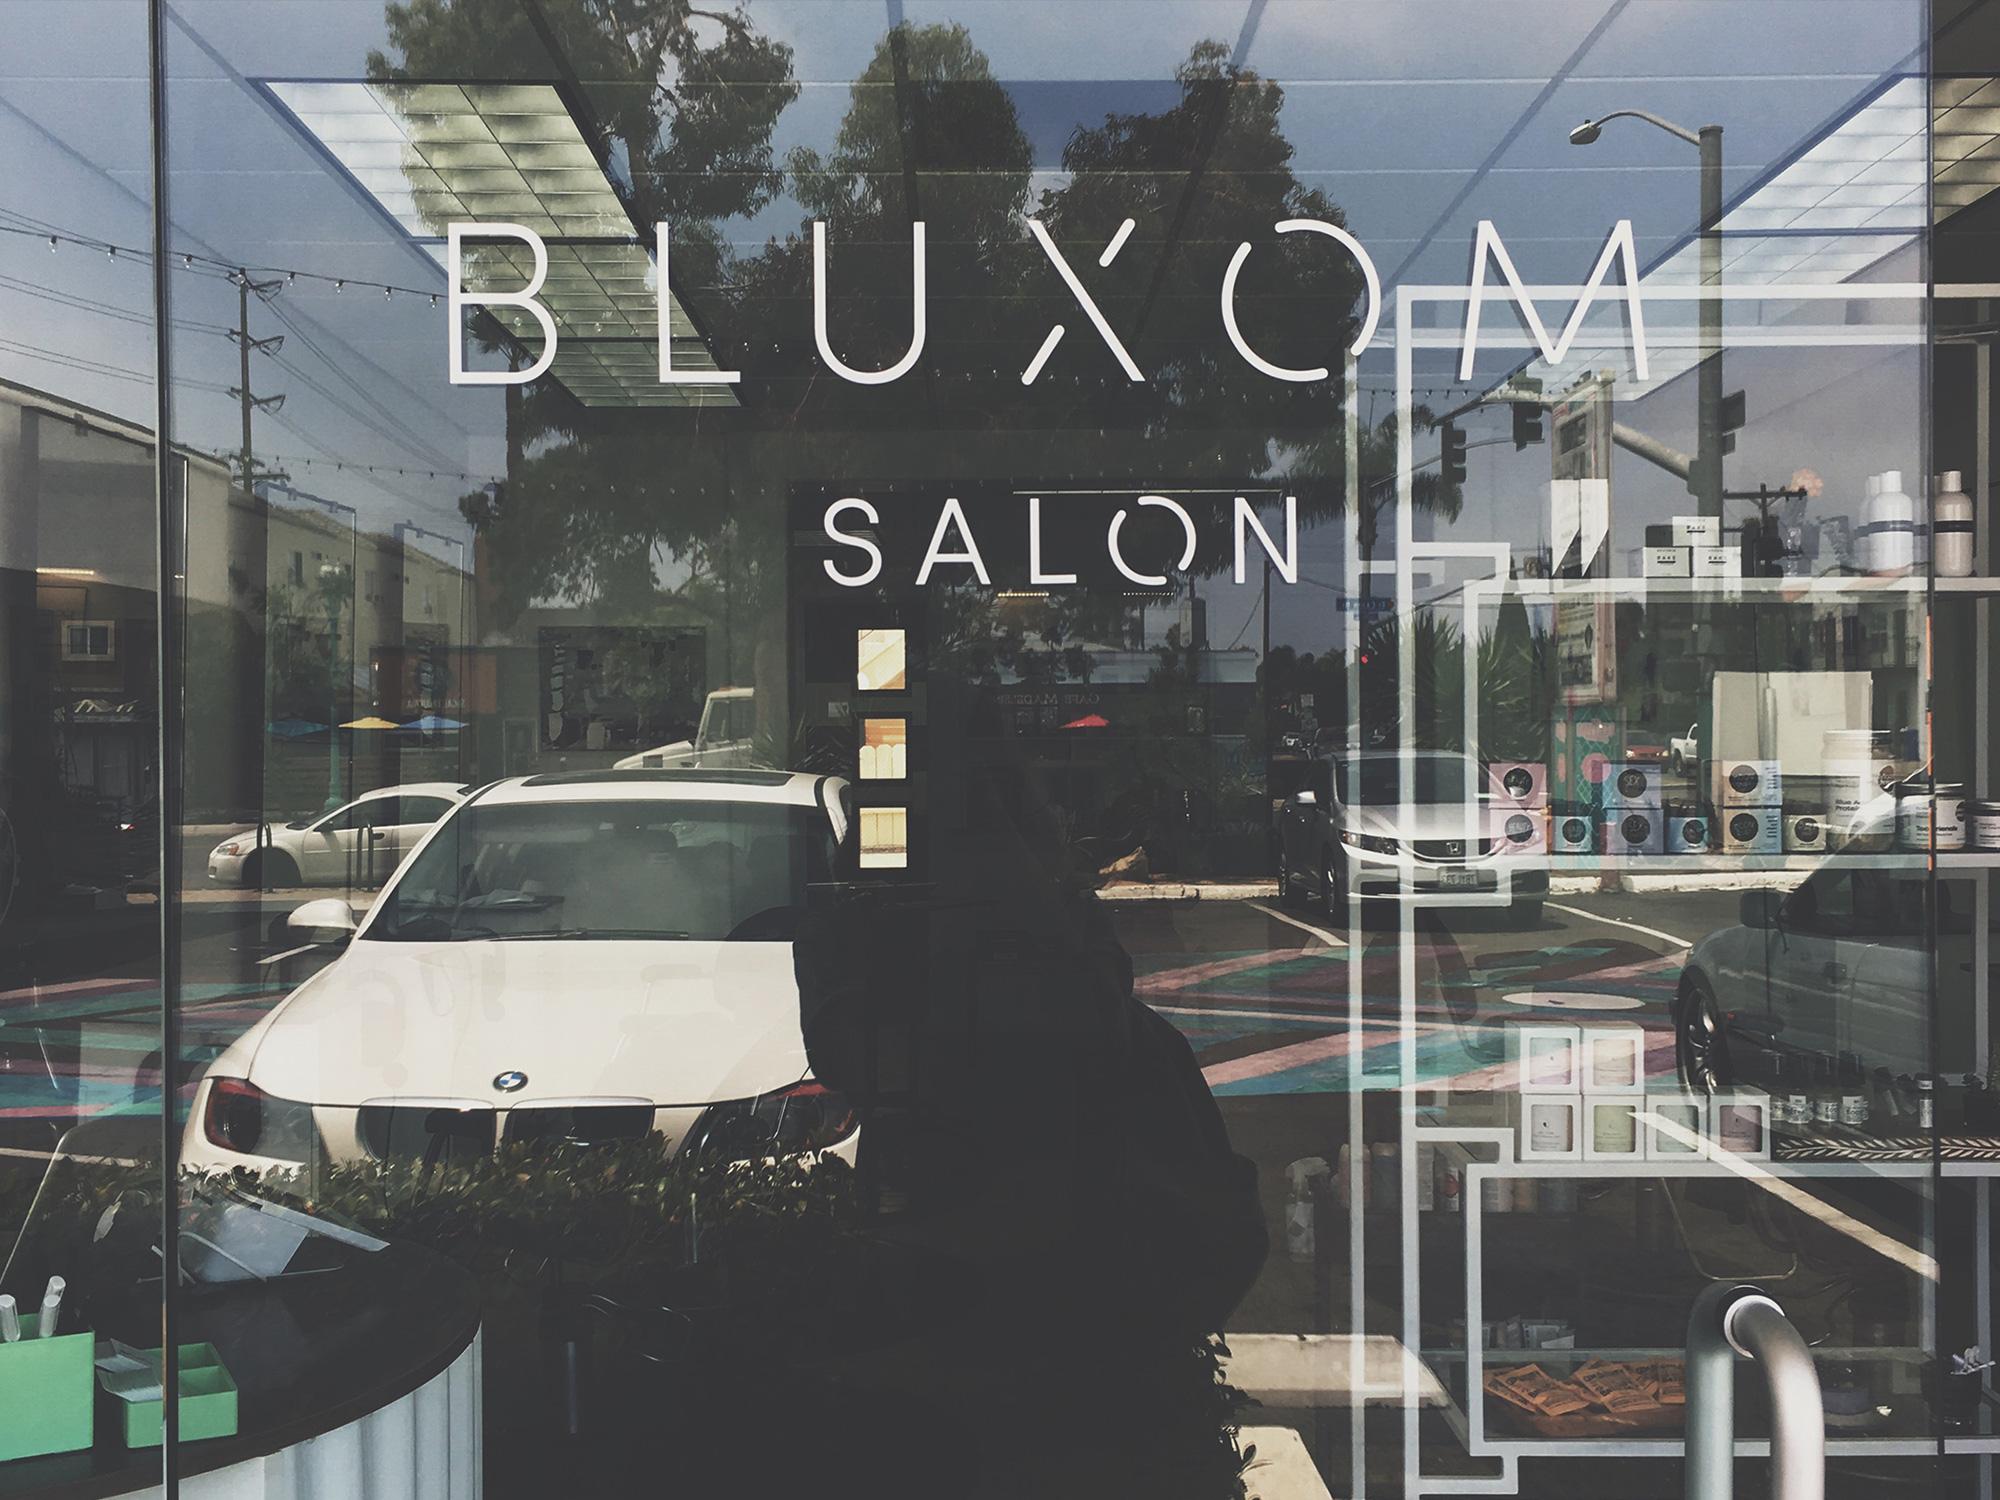 Bluxom Salon Entry Vinyl